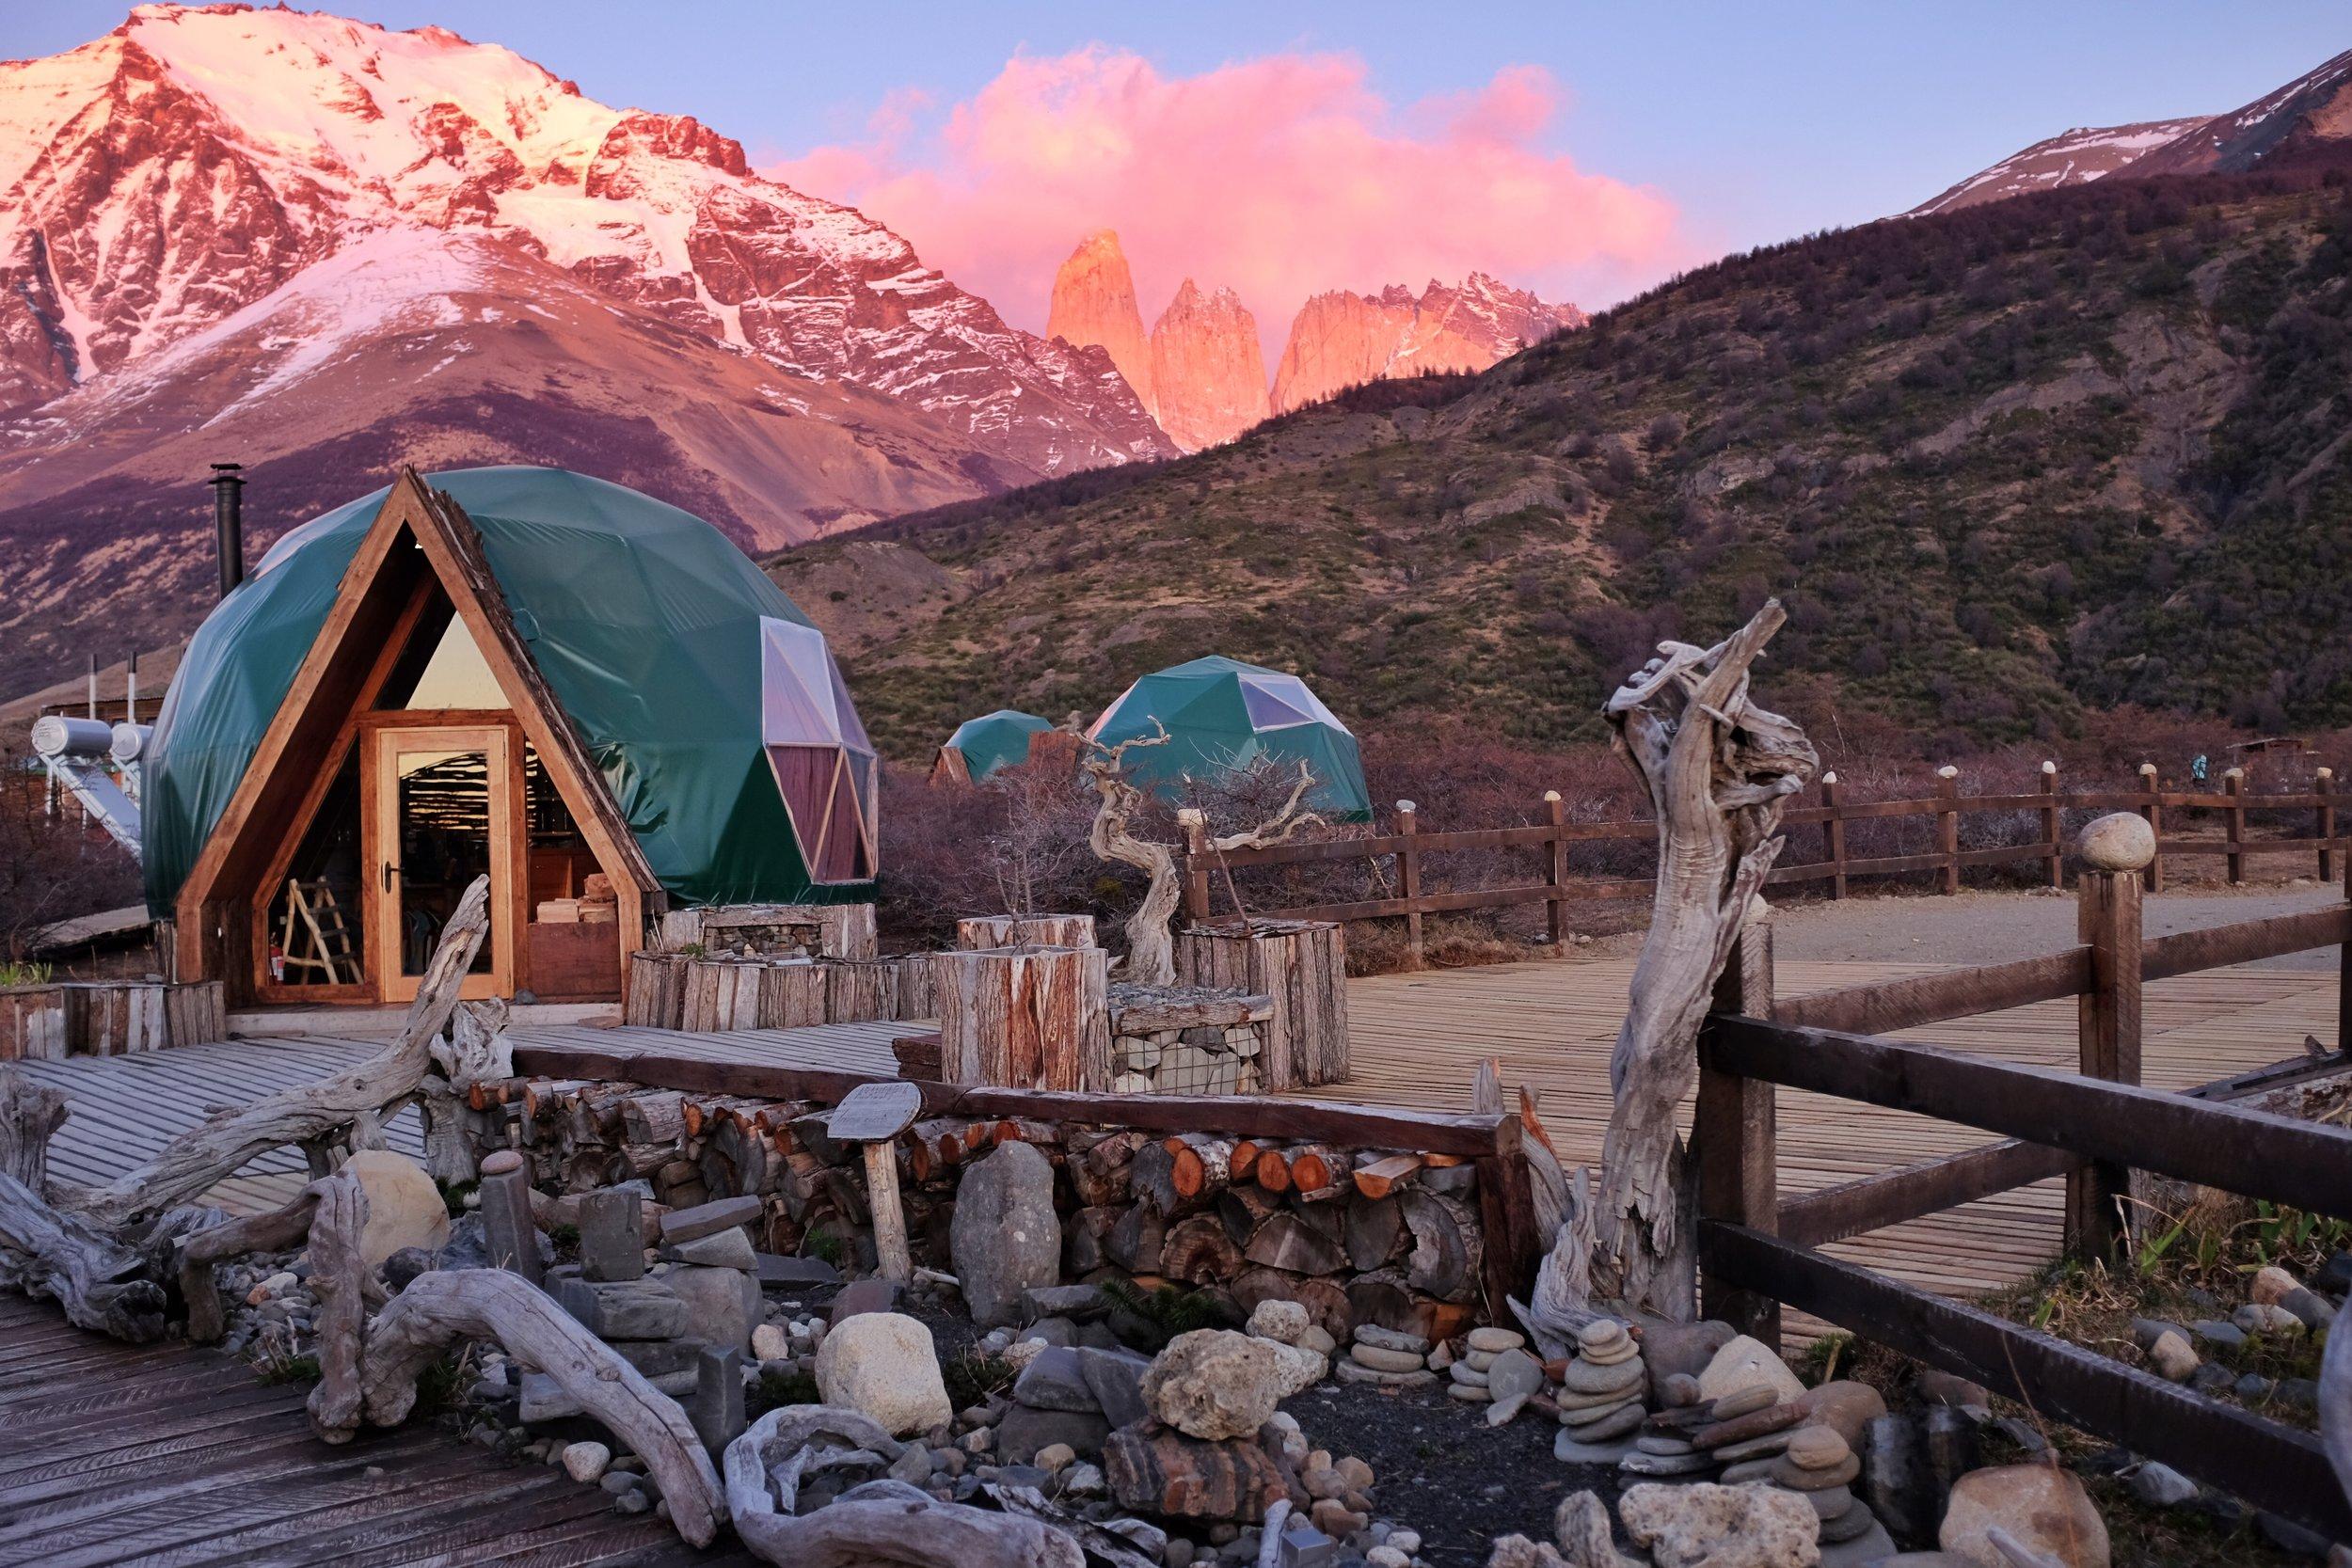 ECOCAMP PATAGONIA - TORRES DEL PAINE, CHILE